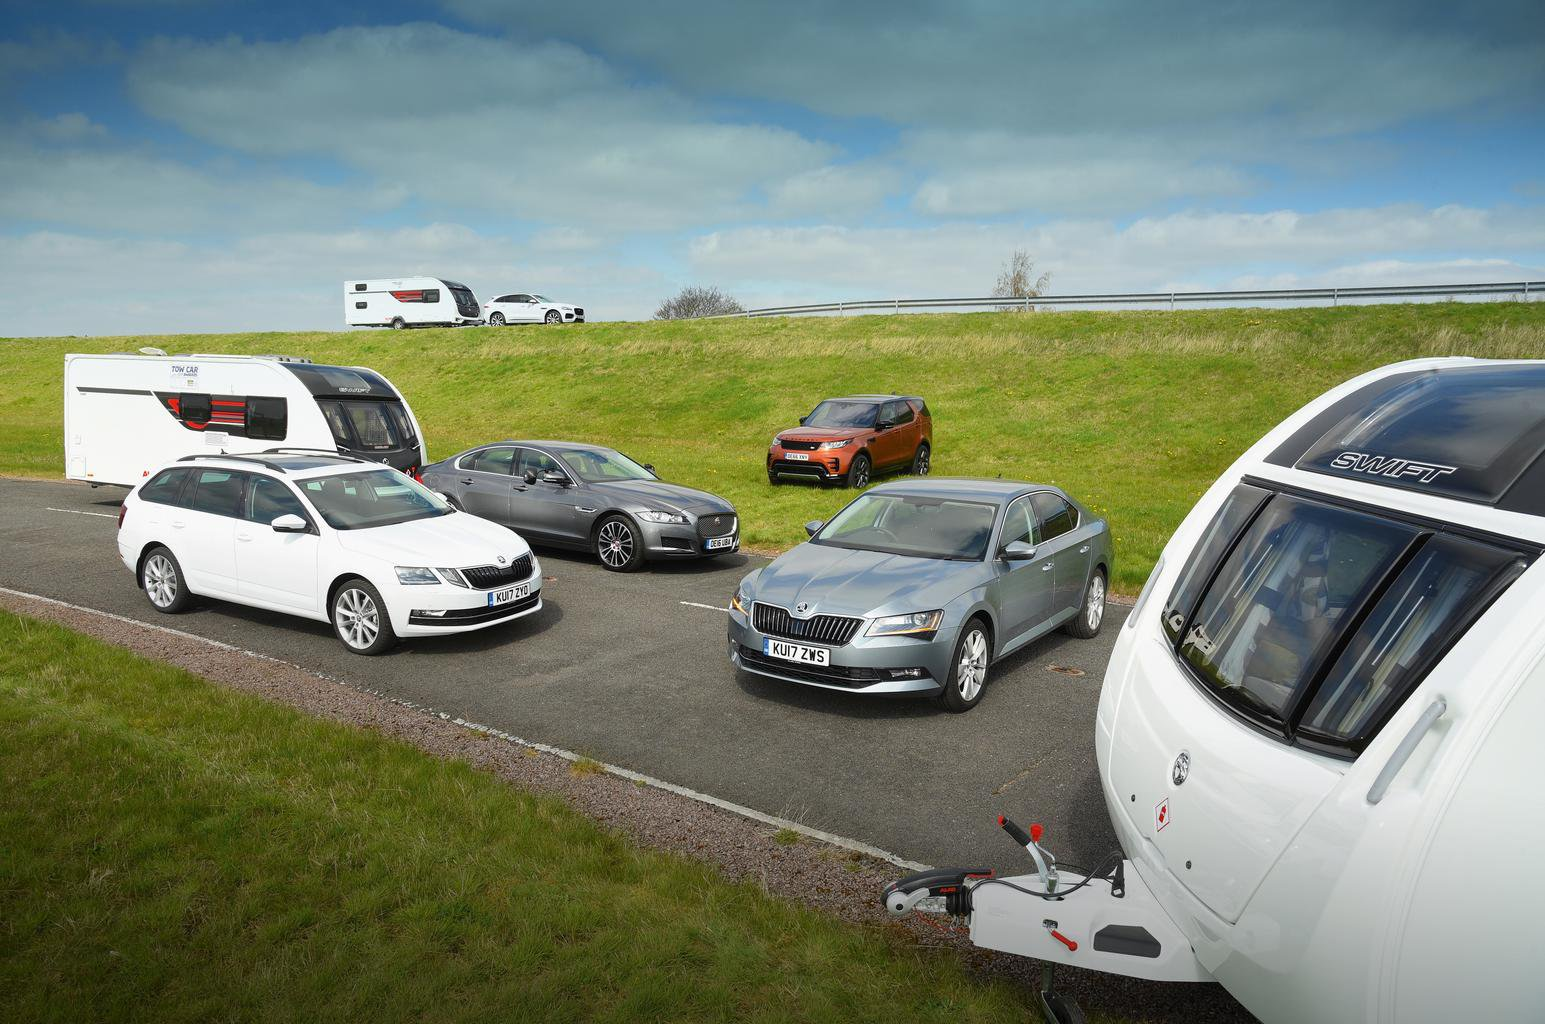 Cars with caravans